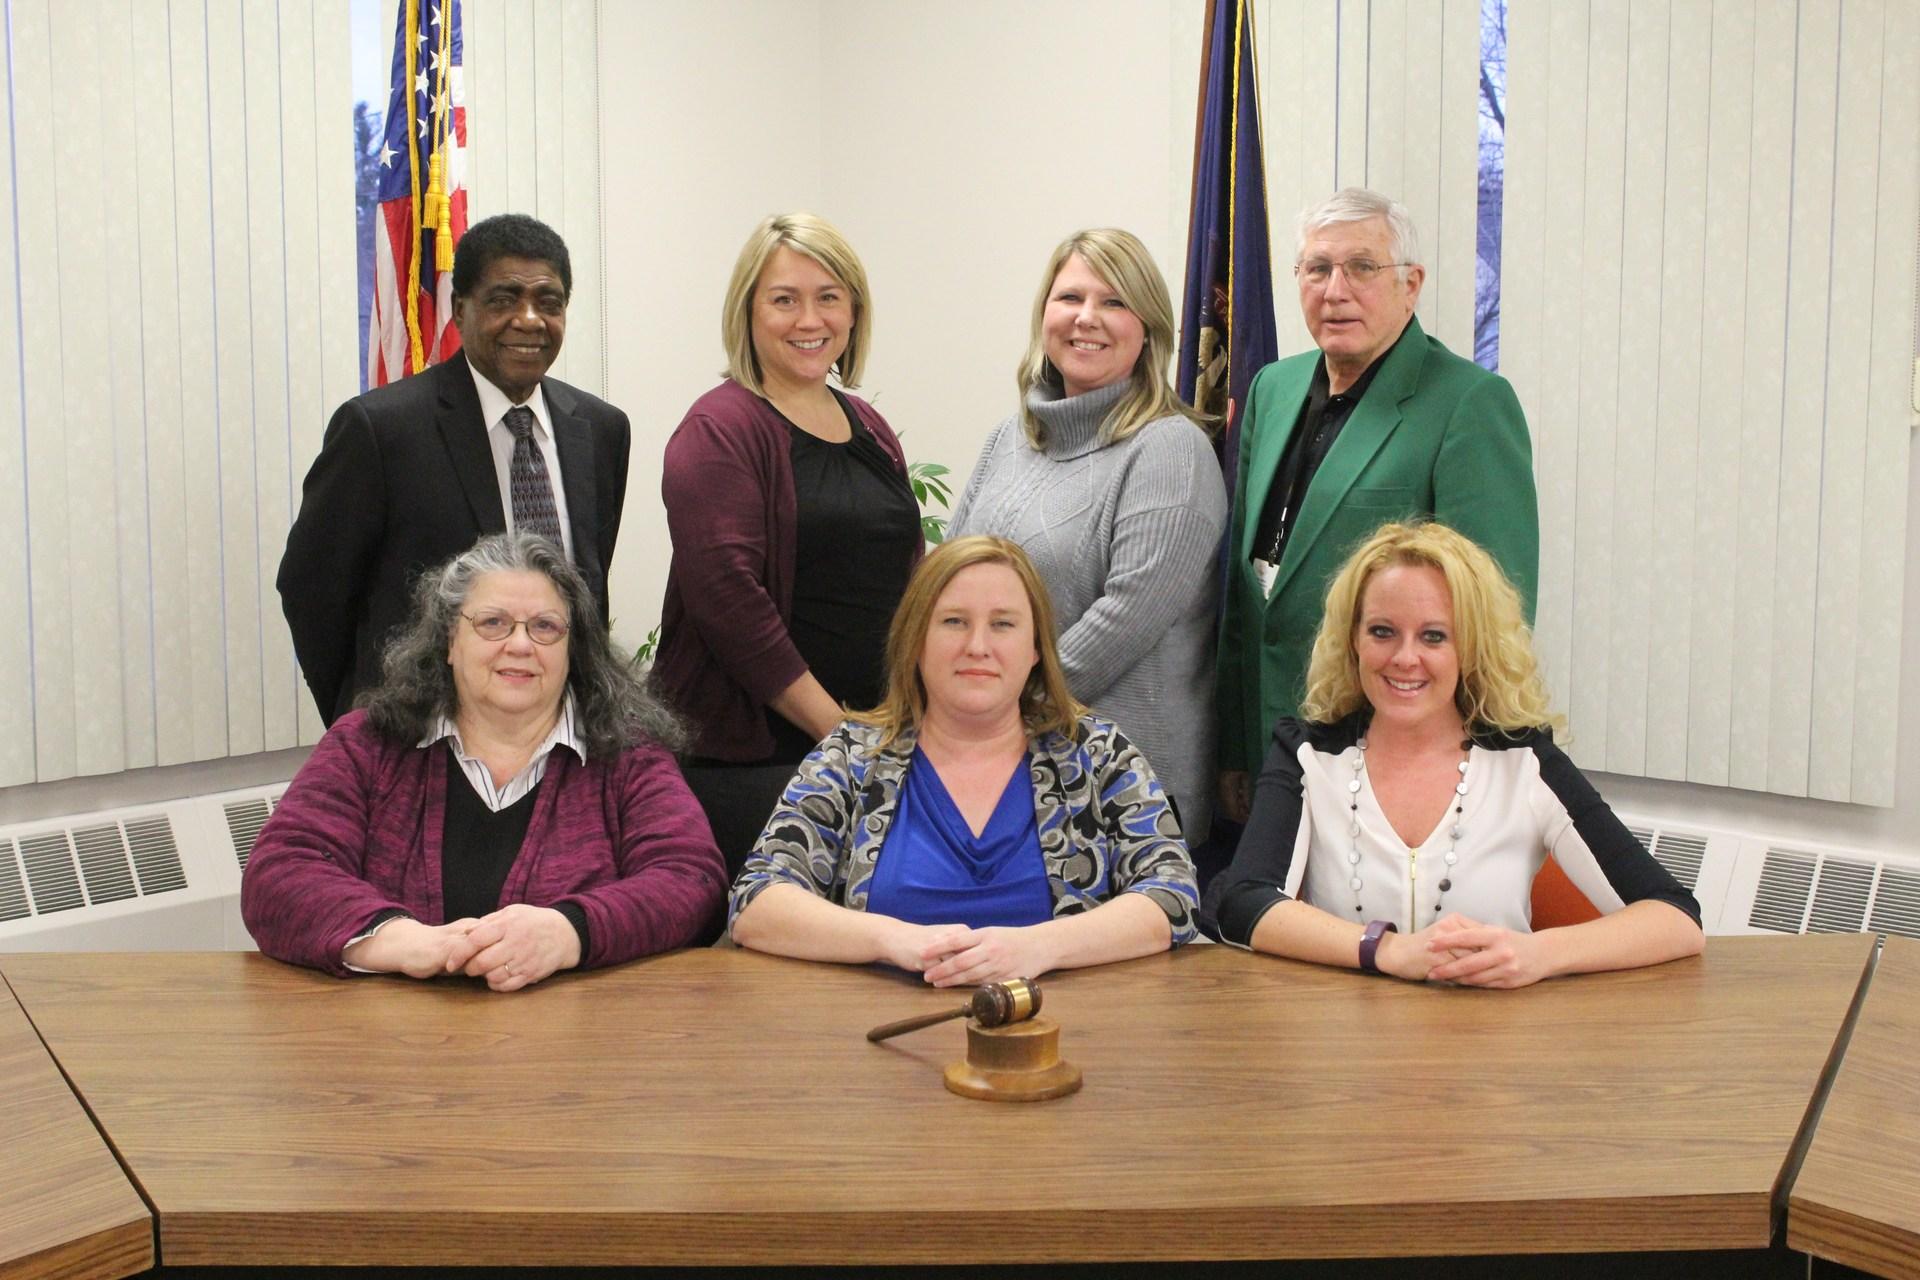 Formal posed photo of 2017-2018 Board of Education including HENRY HATTER, trustee; CARRIE SEKELSKY, Treasurer;  REBECCA AARON, Trustee; ROBERT GAFFNEY, Trustee; MARY ANN DIPZINSKI, Vice President; DENISE FRAPPIER, President;  LYDIA HEINE, Secretary